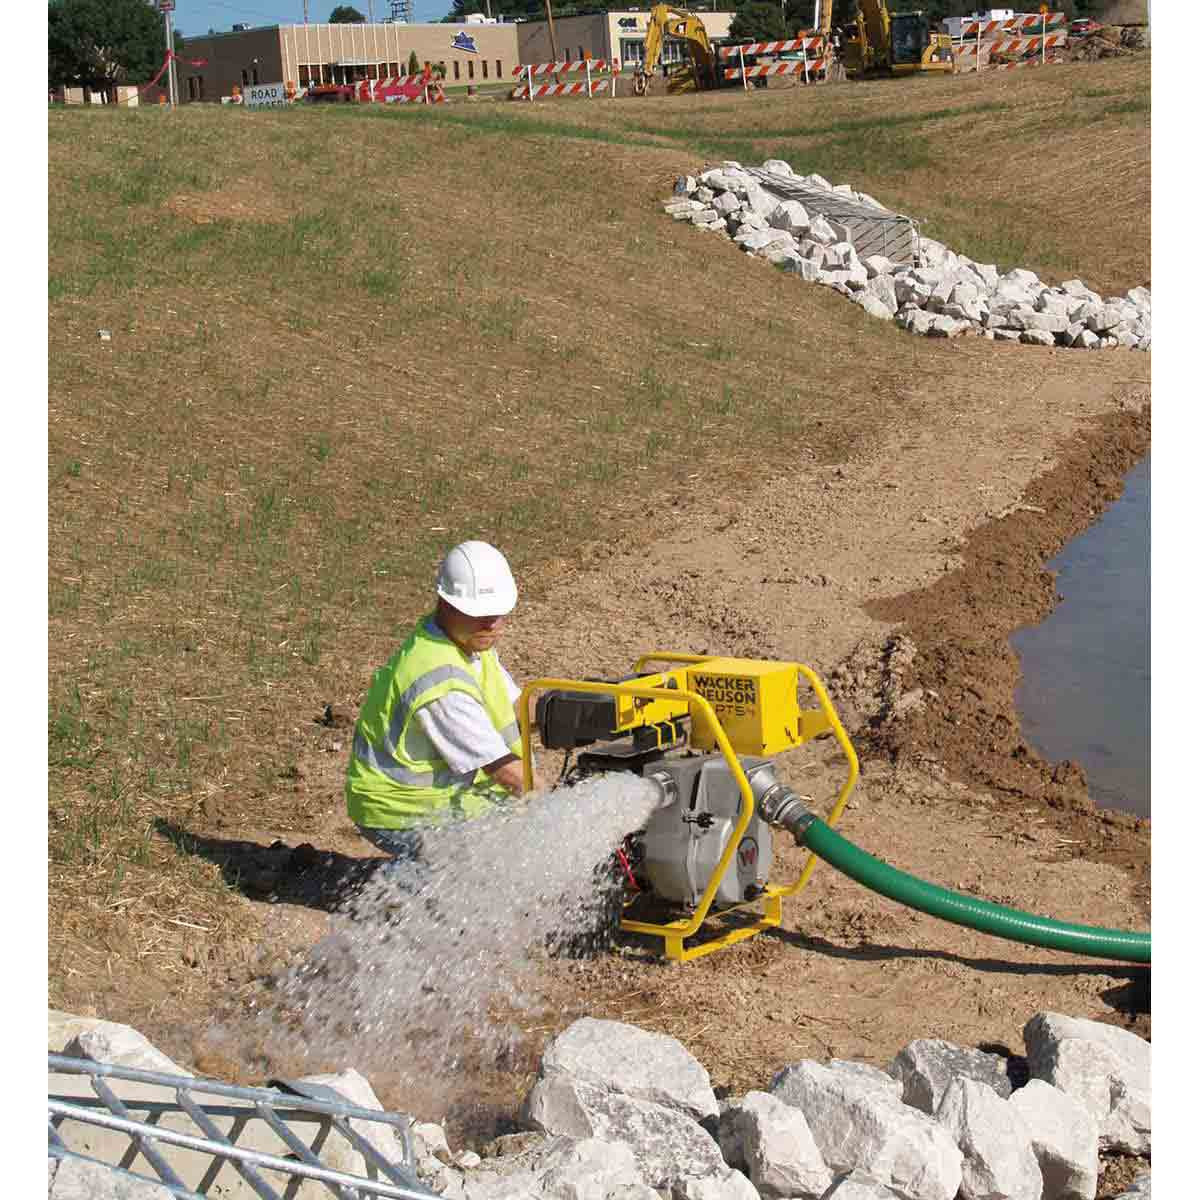 700 gallons per minute Wacker Neuson